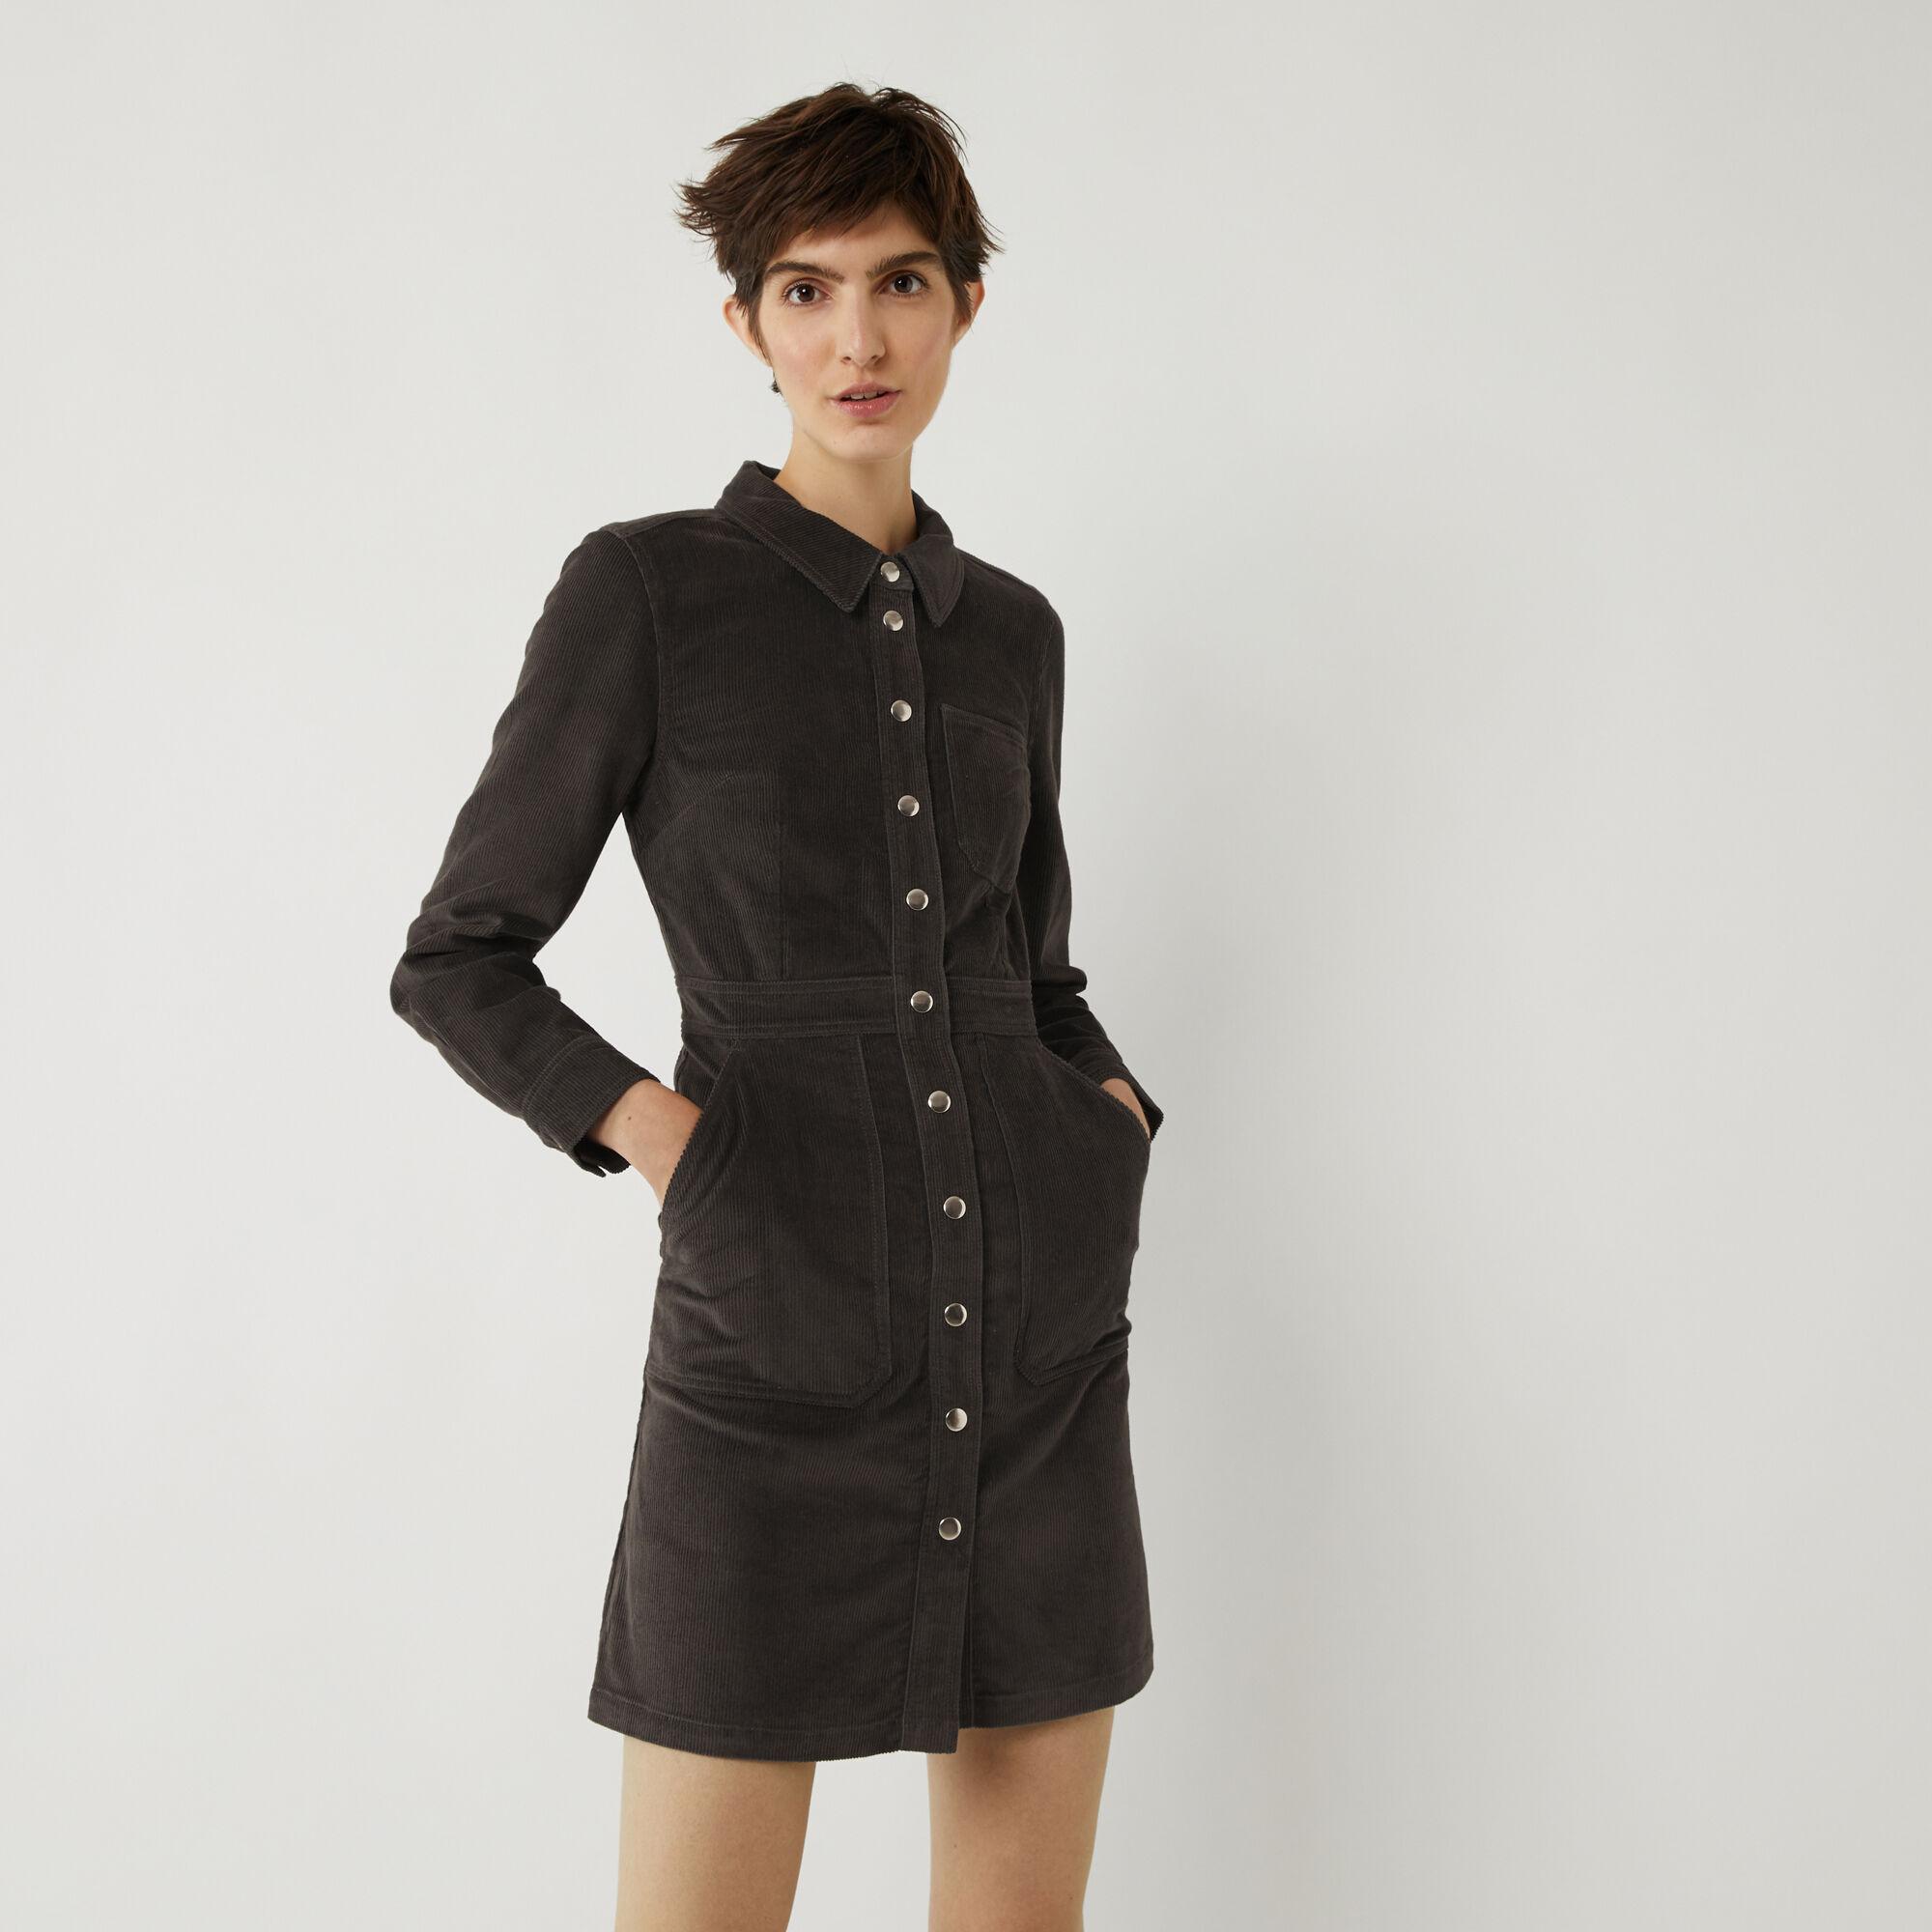 Warehouse, CORD SNAP FRONT DRESS Dark Grey 1